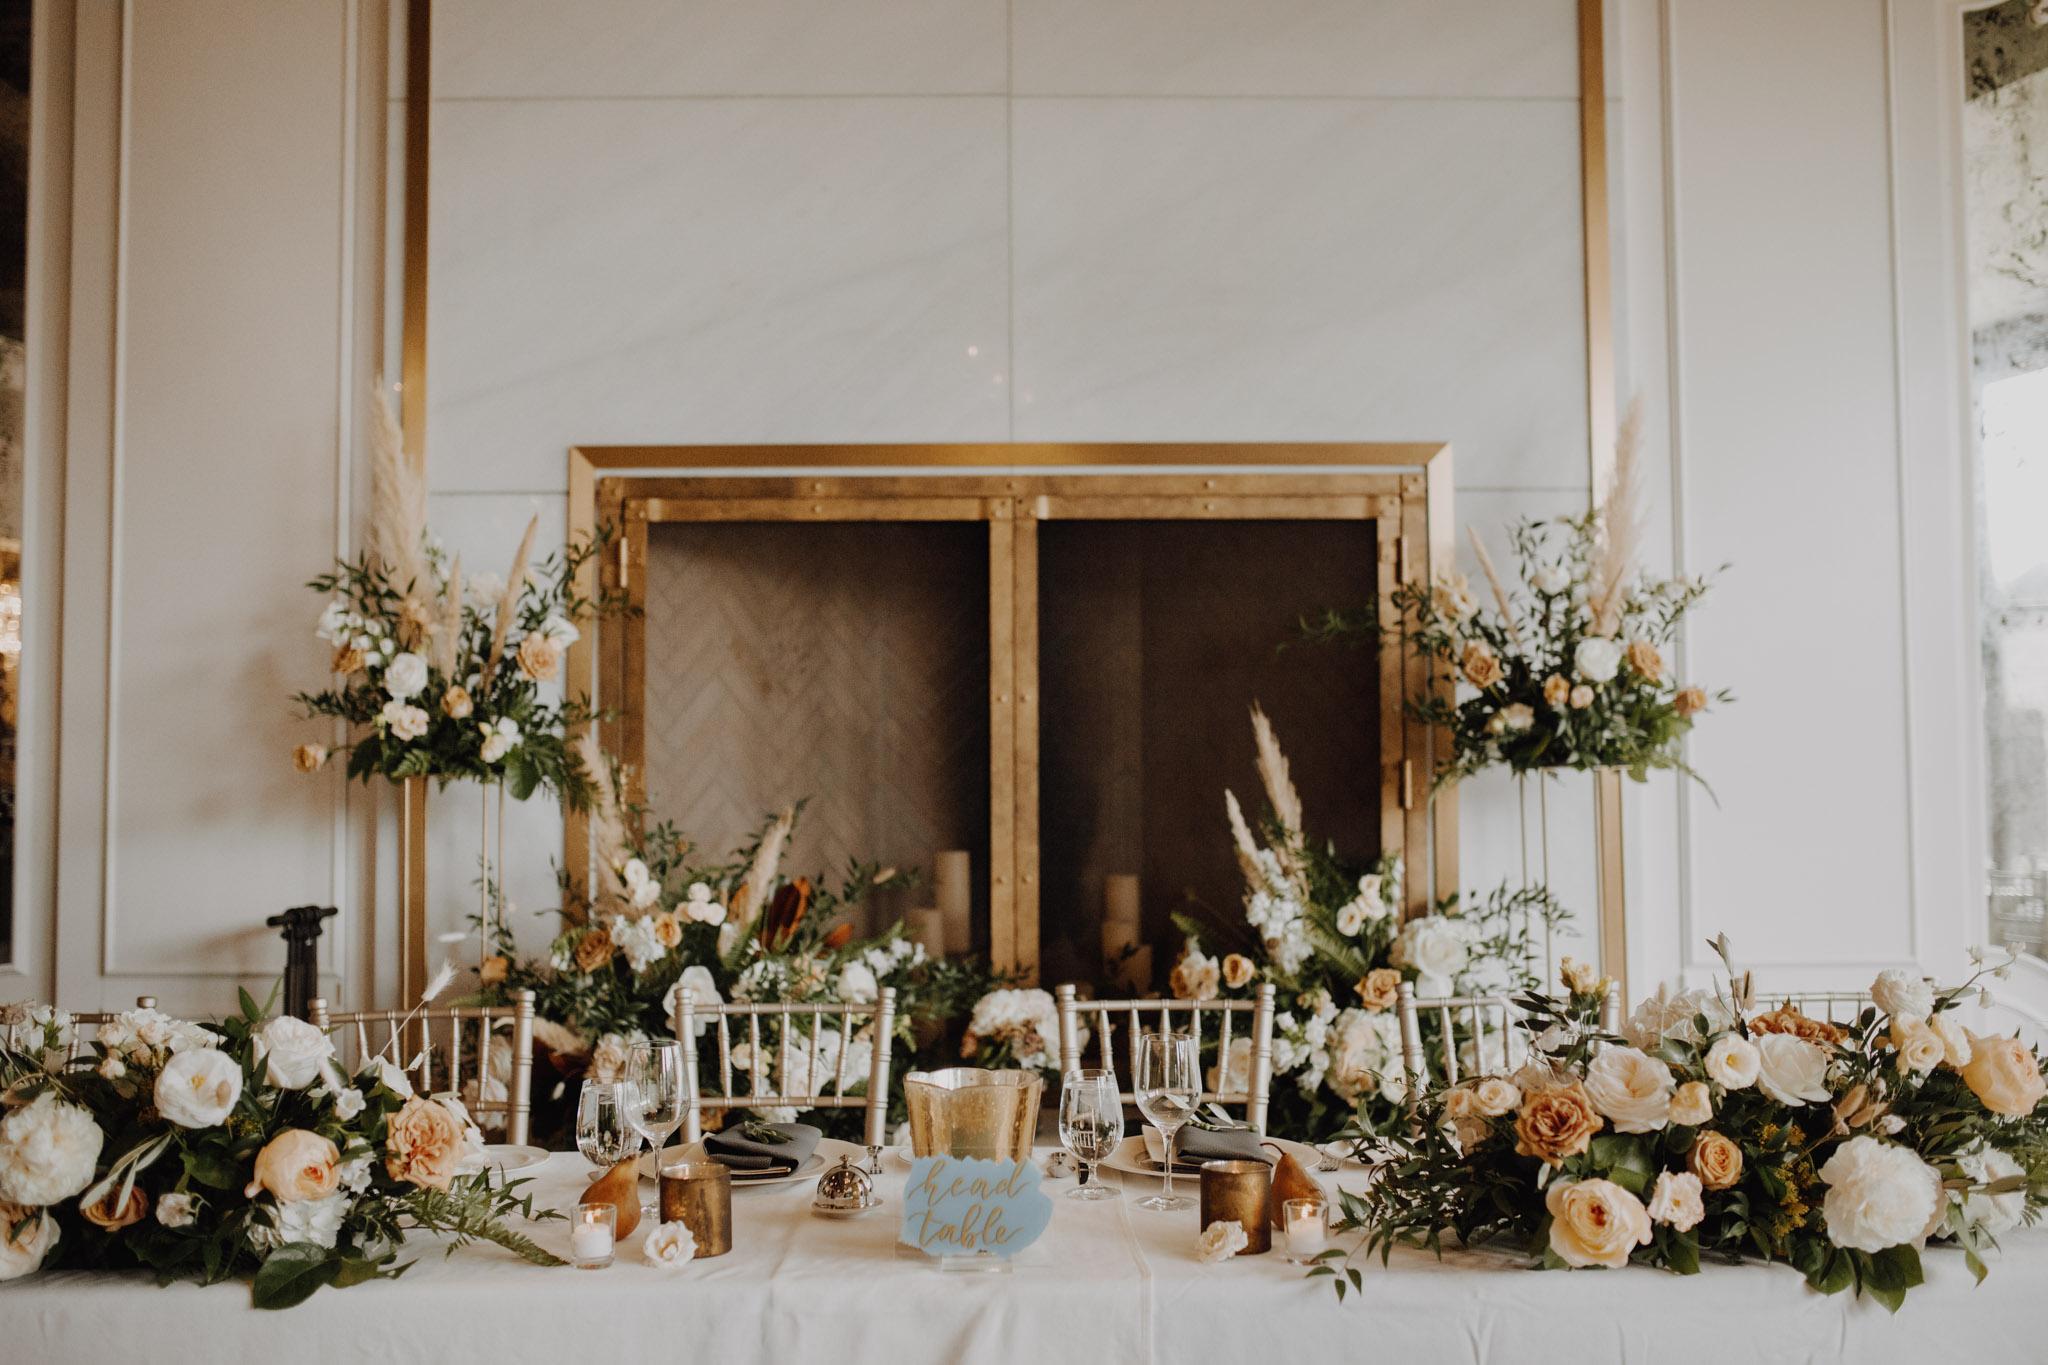 Elora Mill Wedding - peach and gold decor